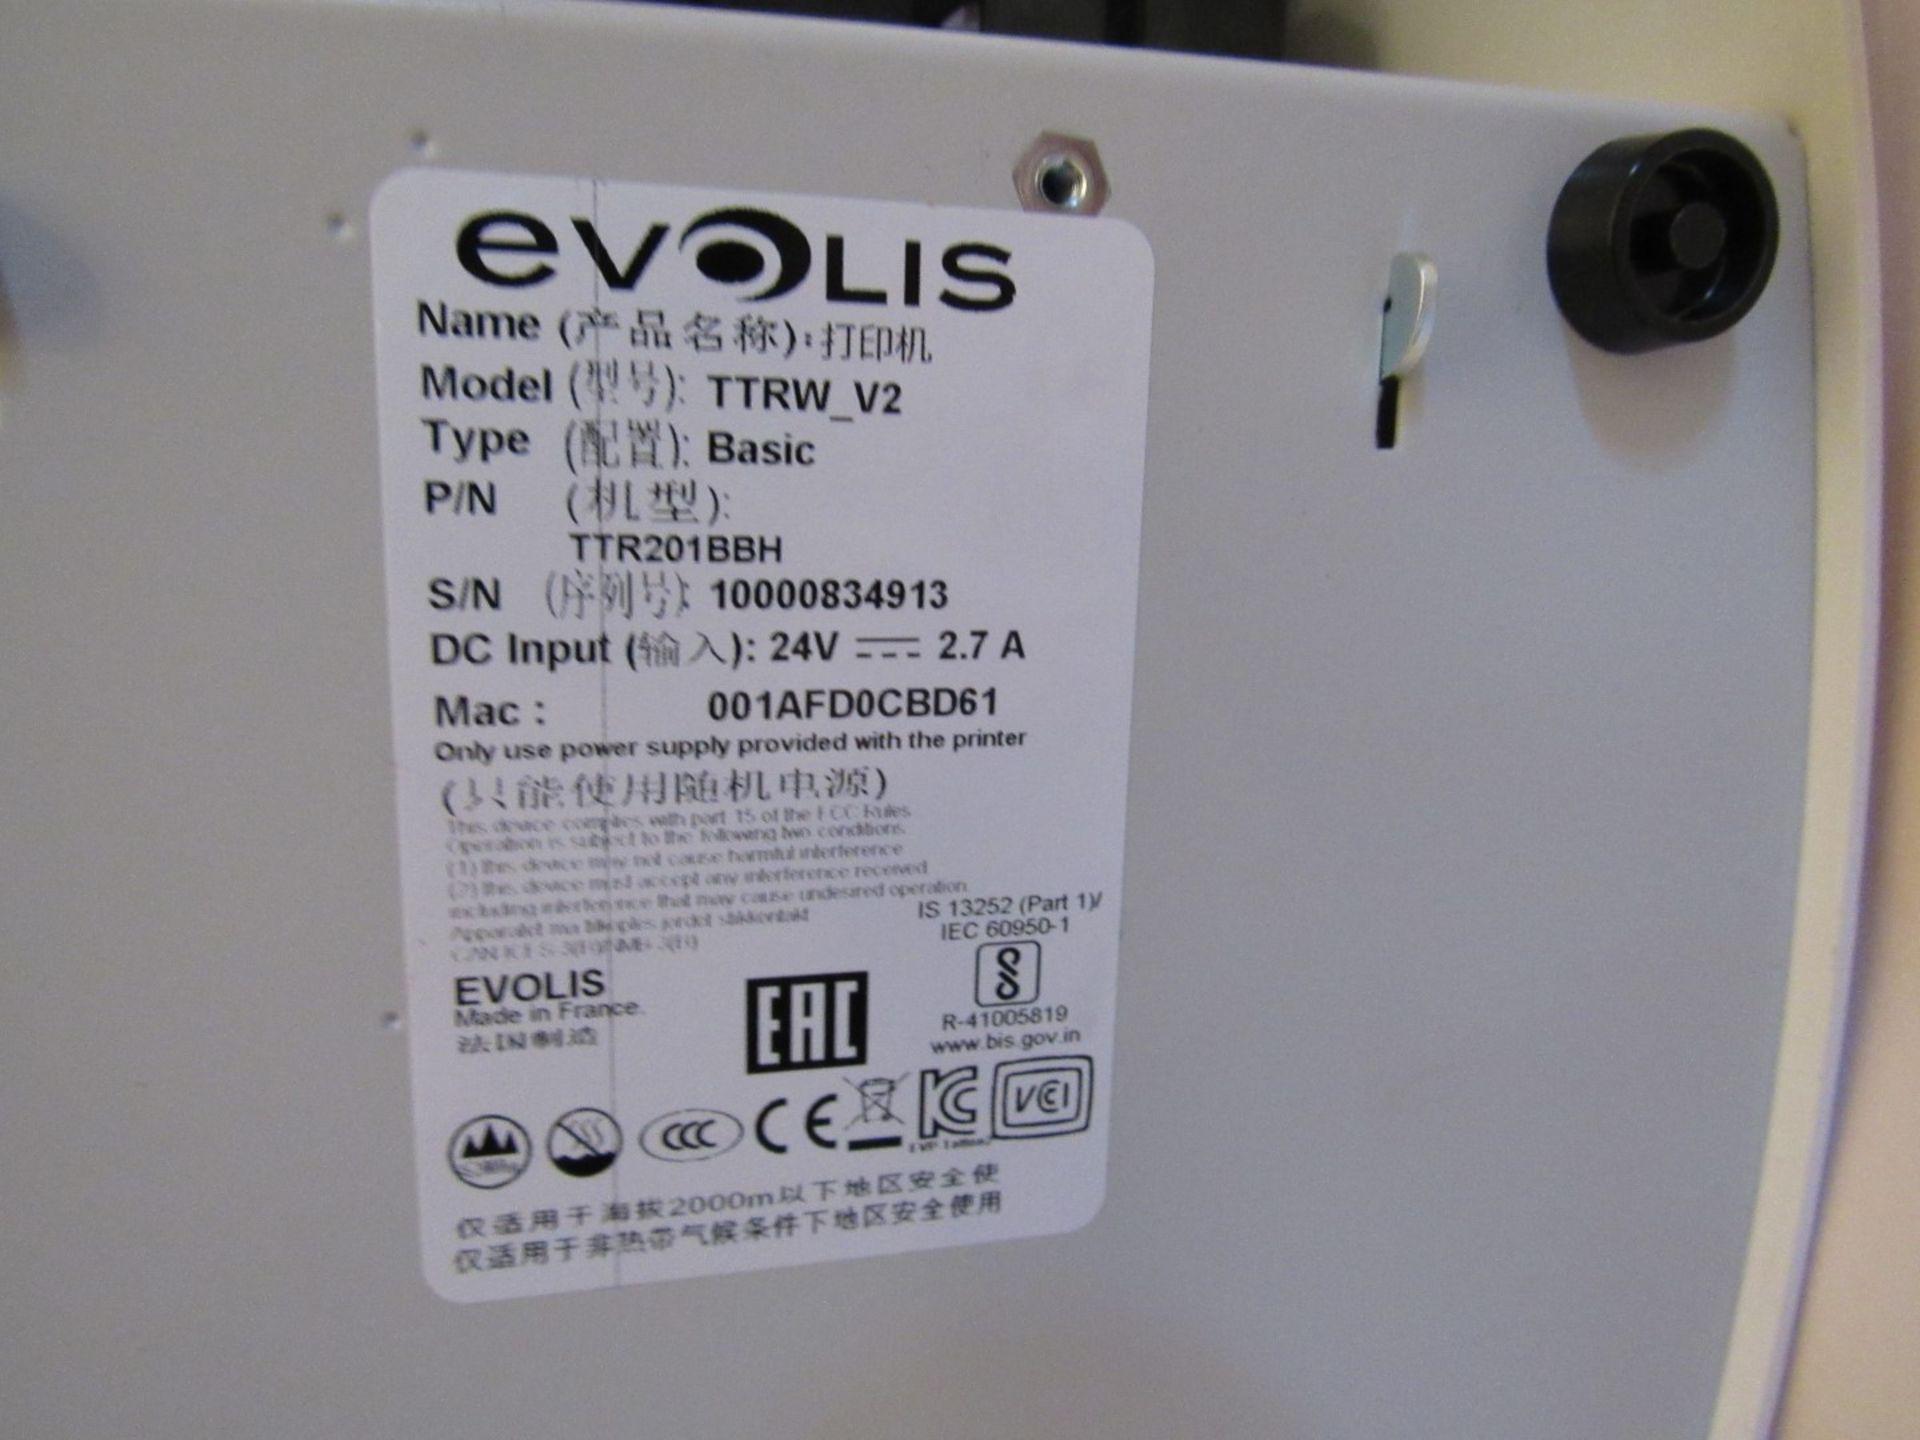 Evolis TTRW_V2 rewriteable ID Card printer (Locati - Image 7 of 8